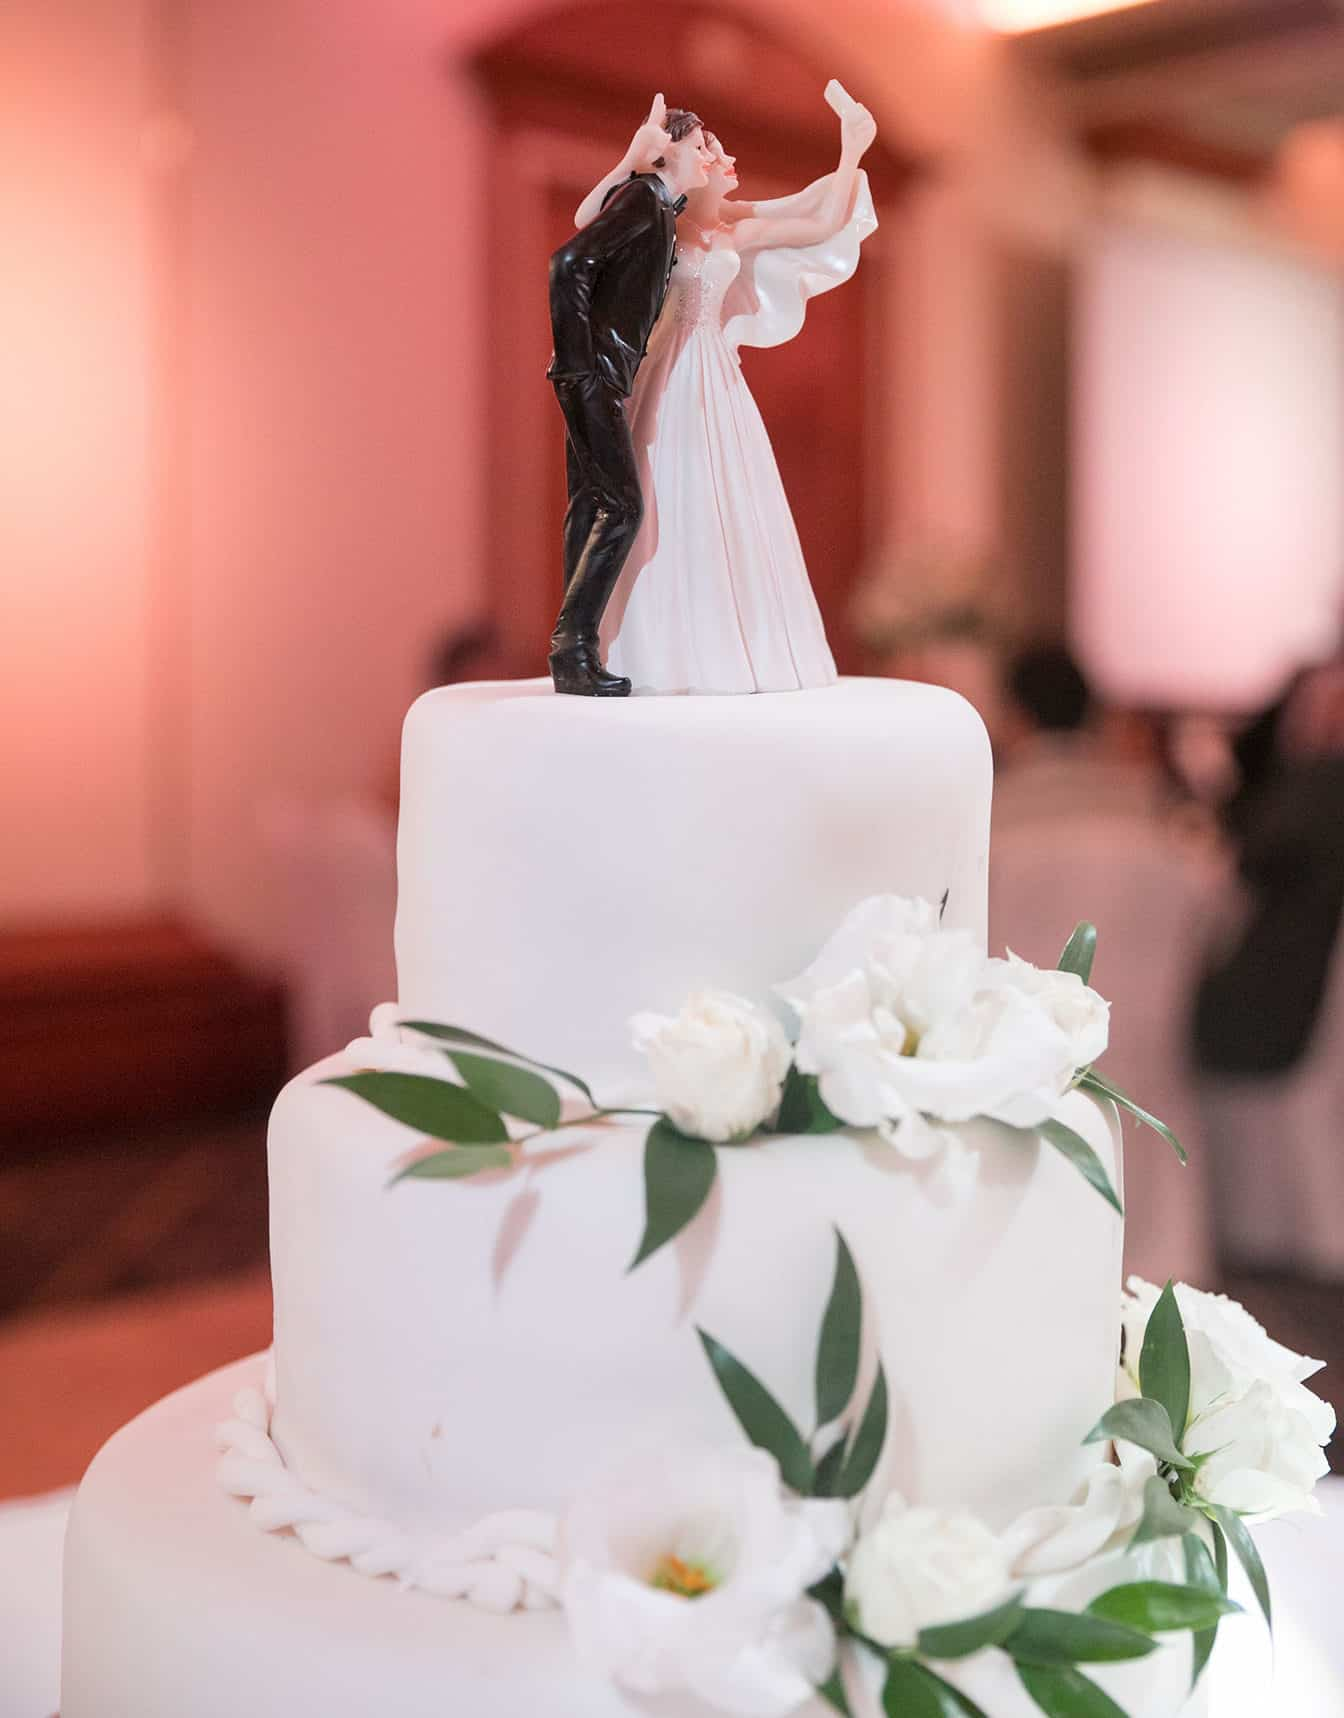 wedding cake with white flowers